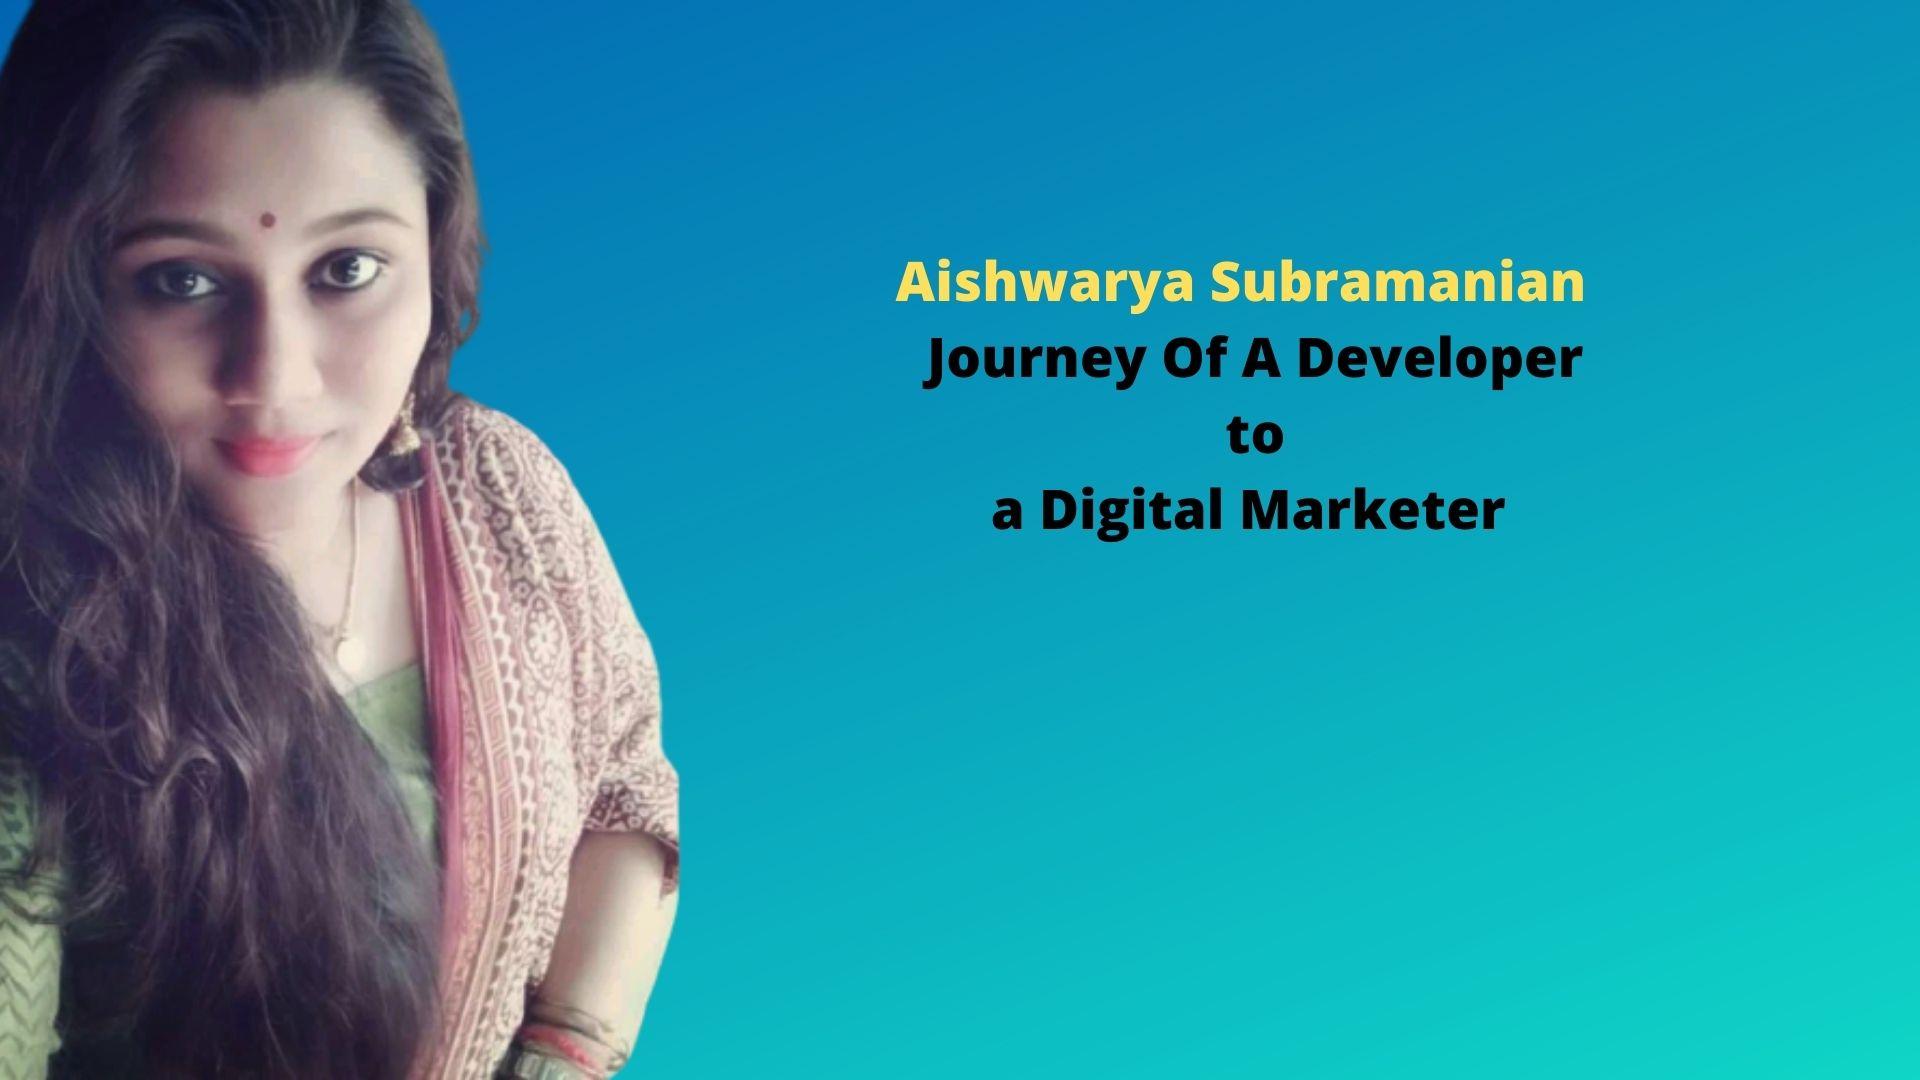 Journey Of A Developer to a Digital Marketer